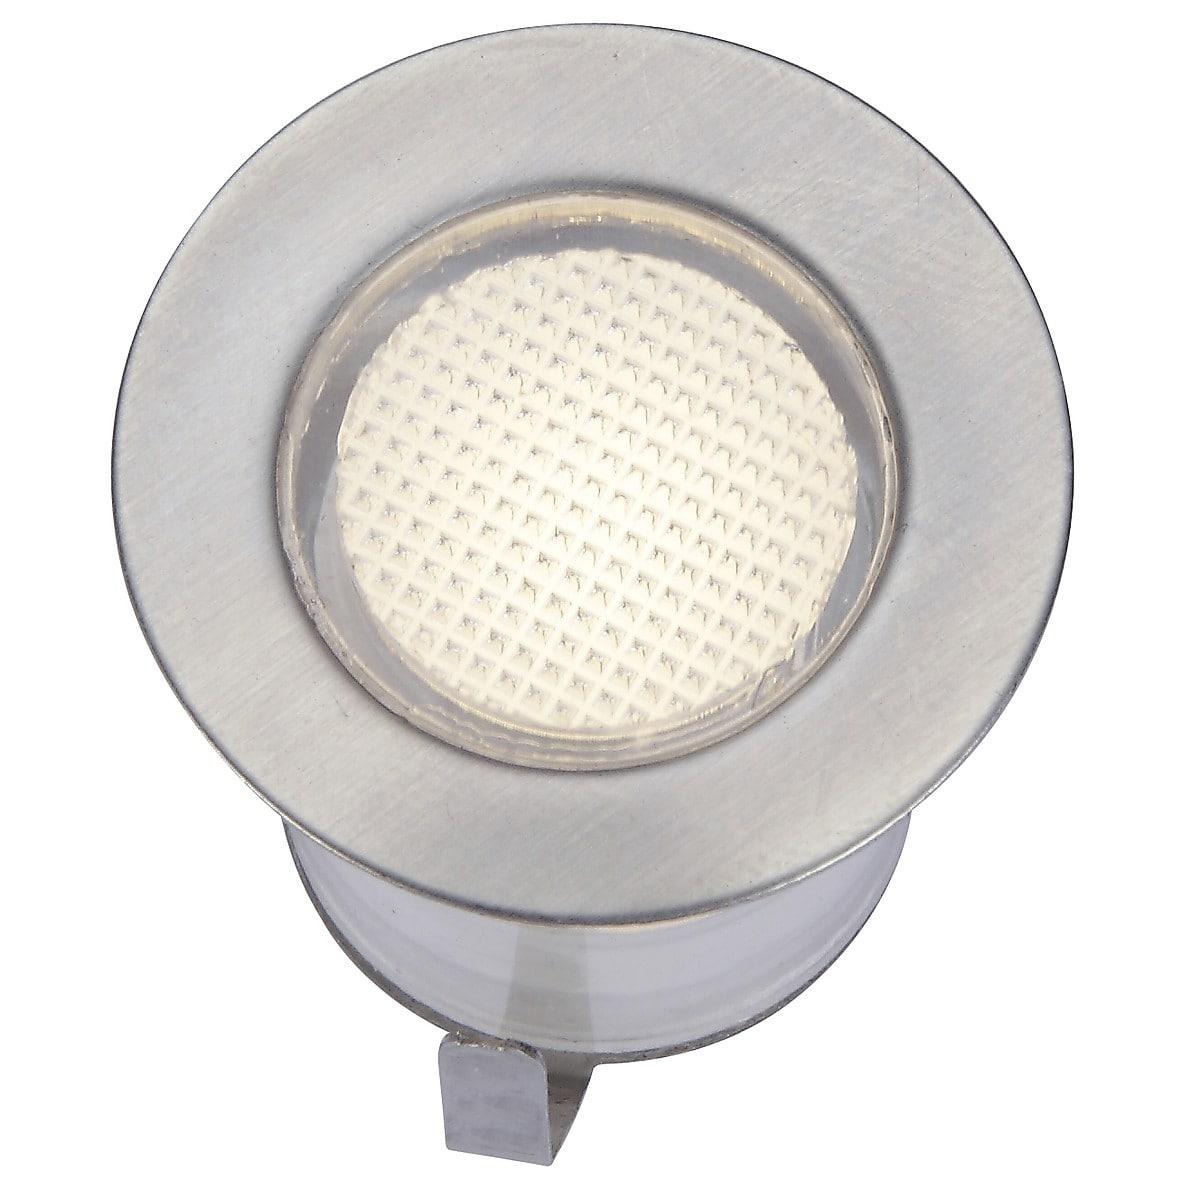 Decklight LED 6-pack